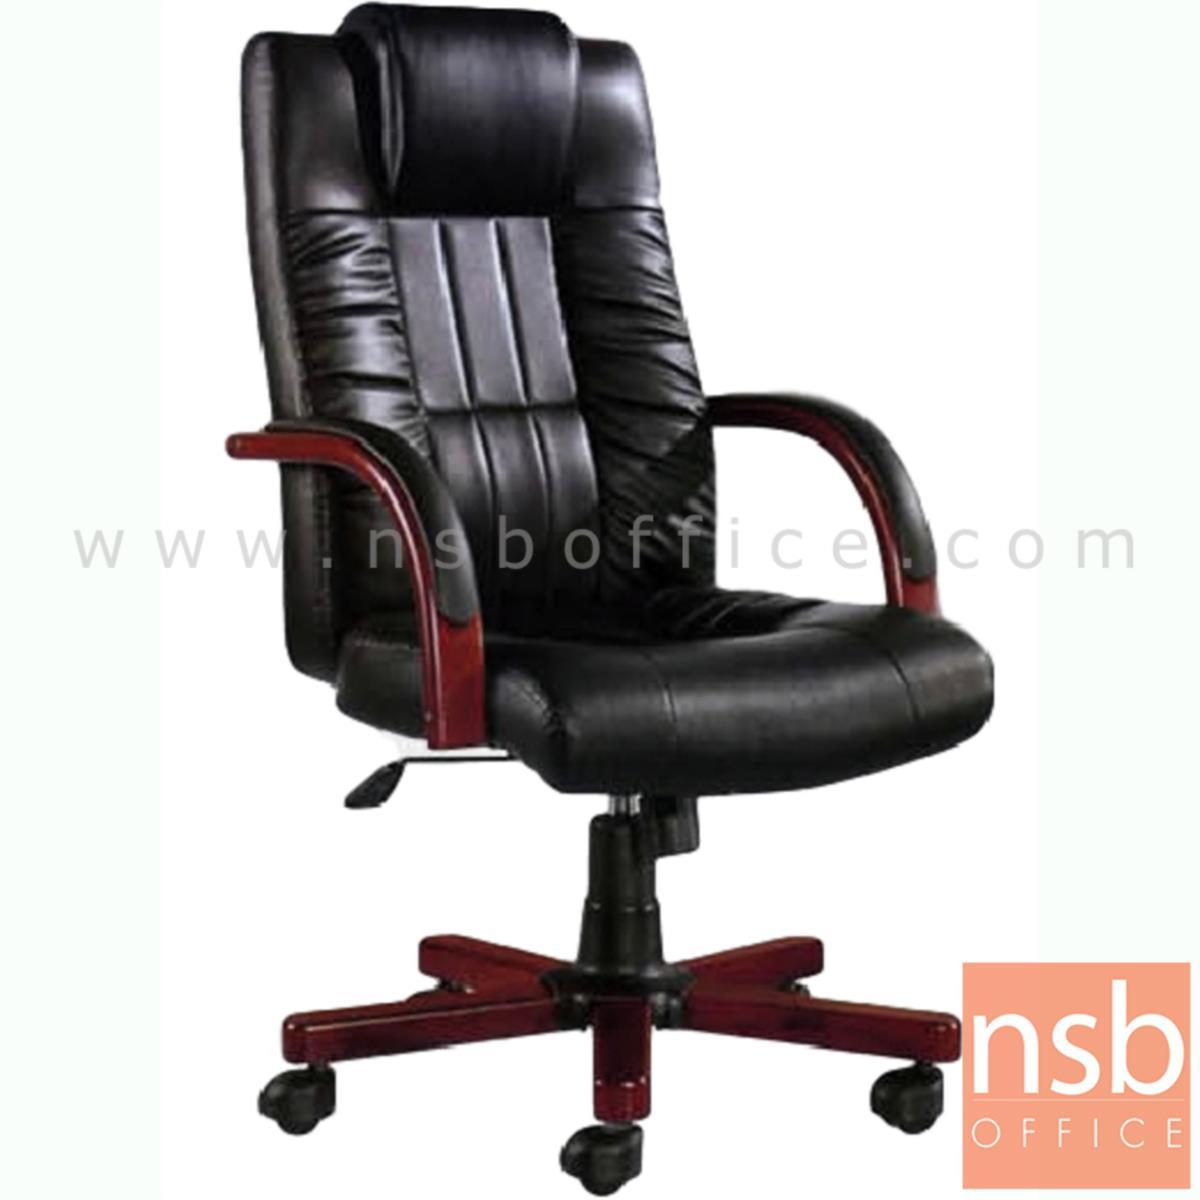 B25A057:เก้าอี้ผู้บริหารหนัง PU รุ่น Bonnie (บอนนีย์)  โช๊คแก๊ส มีก้อนโยก ขาไม้